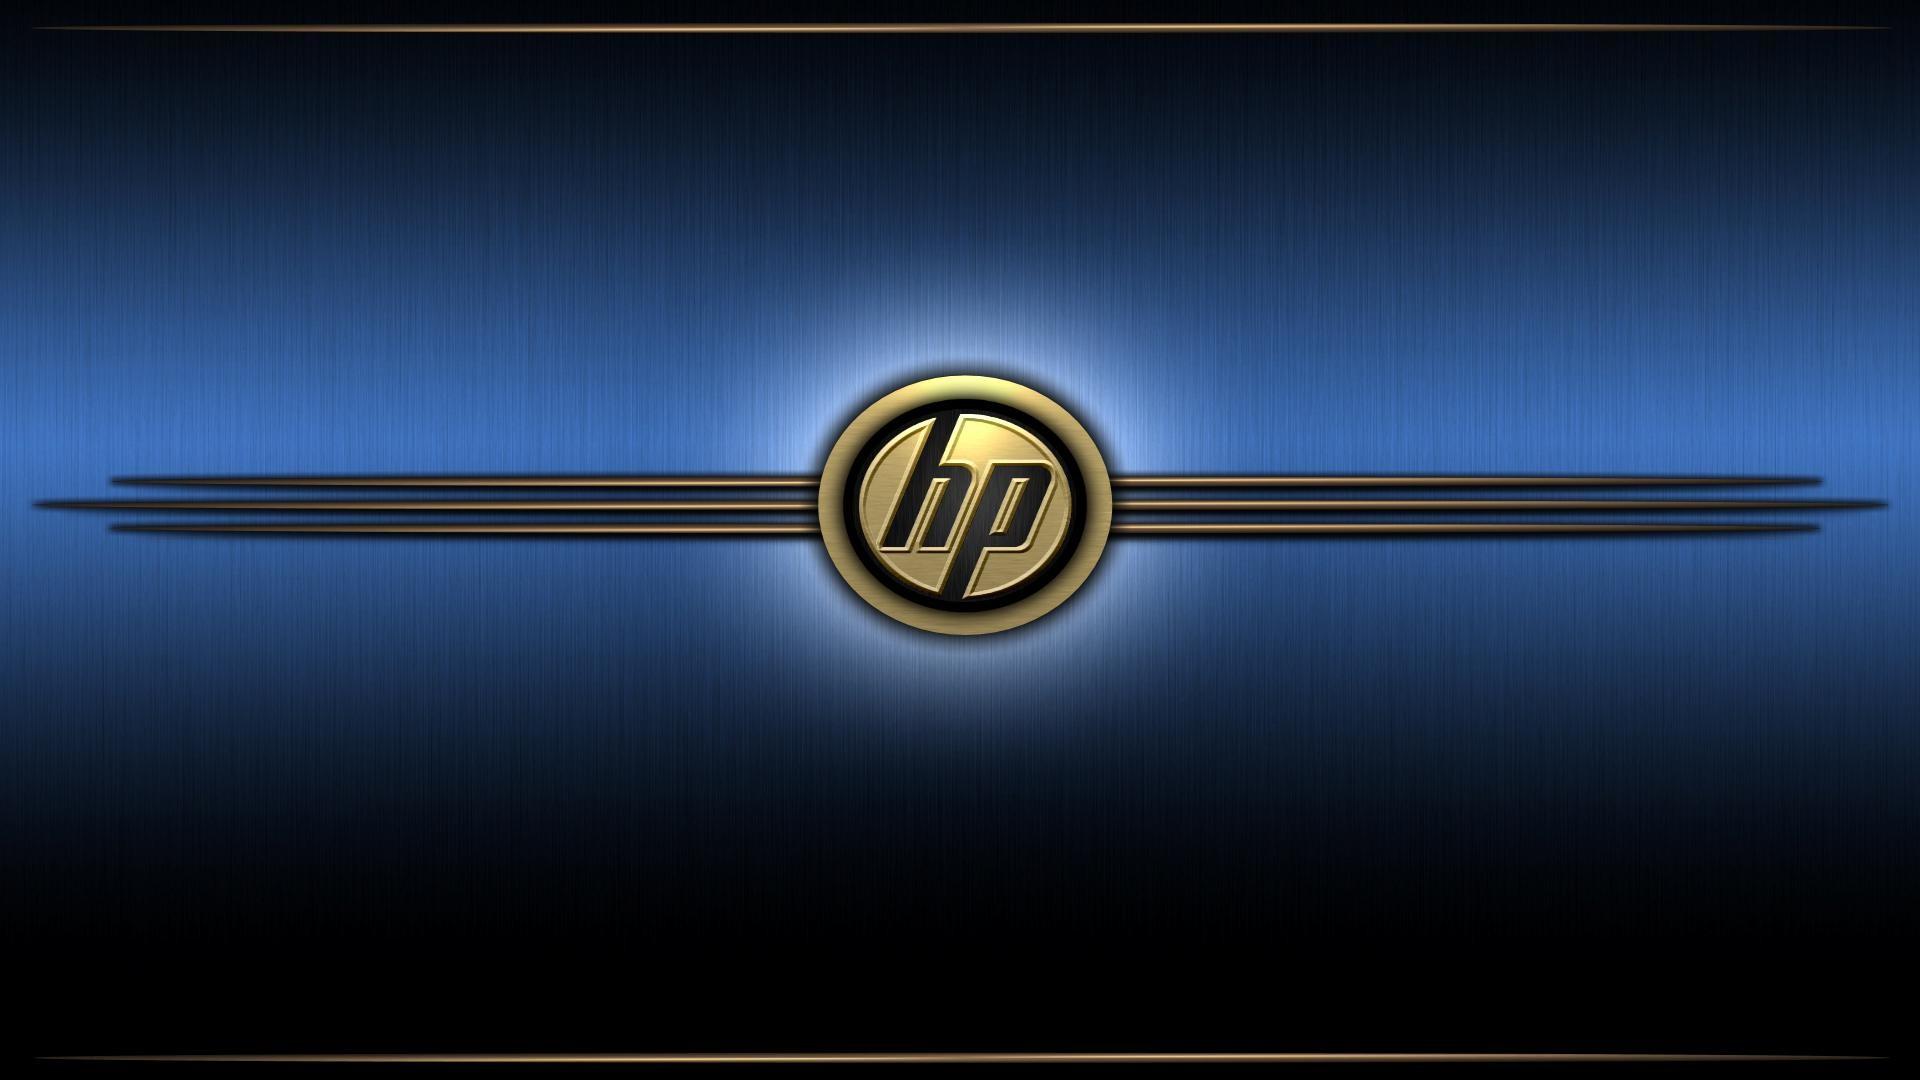 HP HD Wallpaper 67 Images